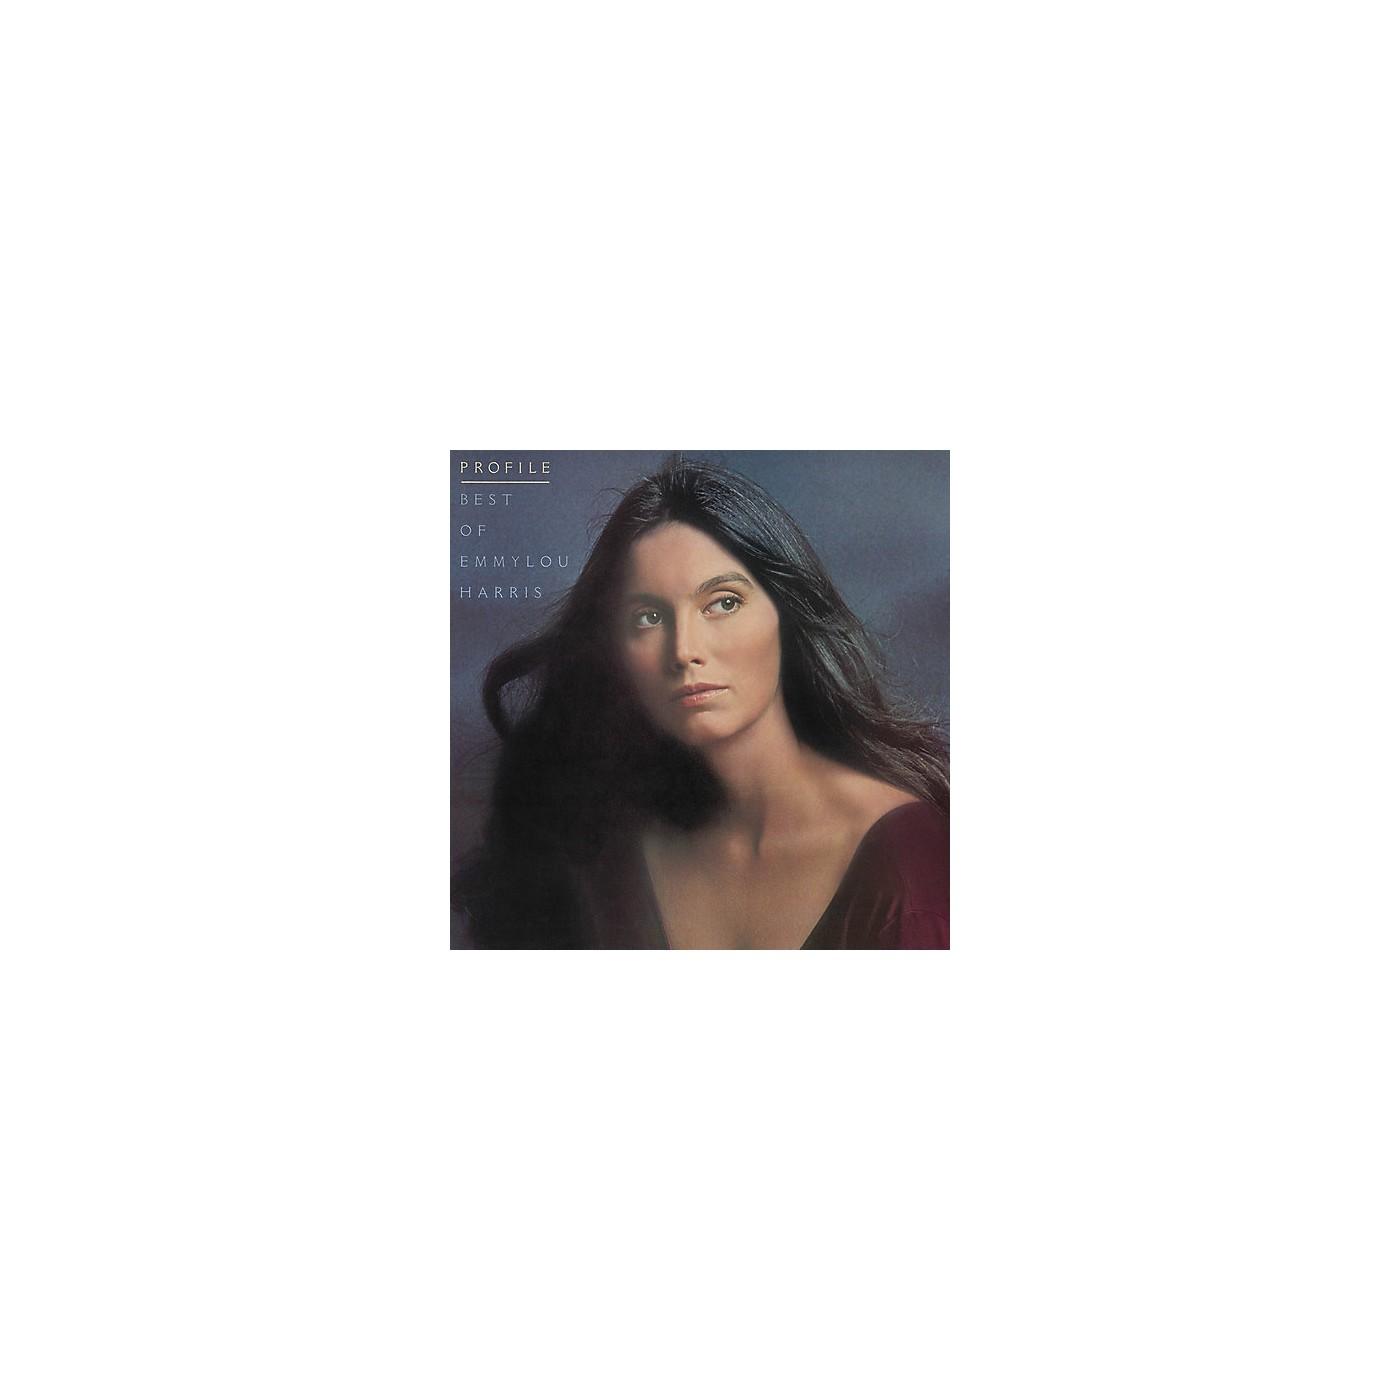 Alliance Emmylou Harris - Profile: Best of Emmylou Harris thumbnail